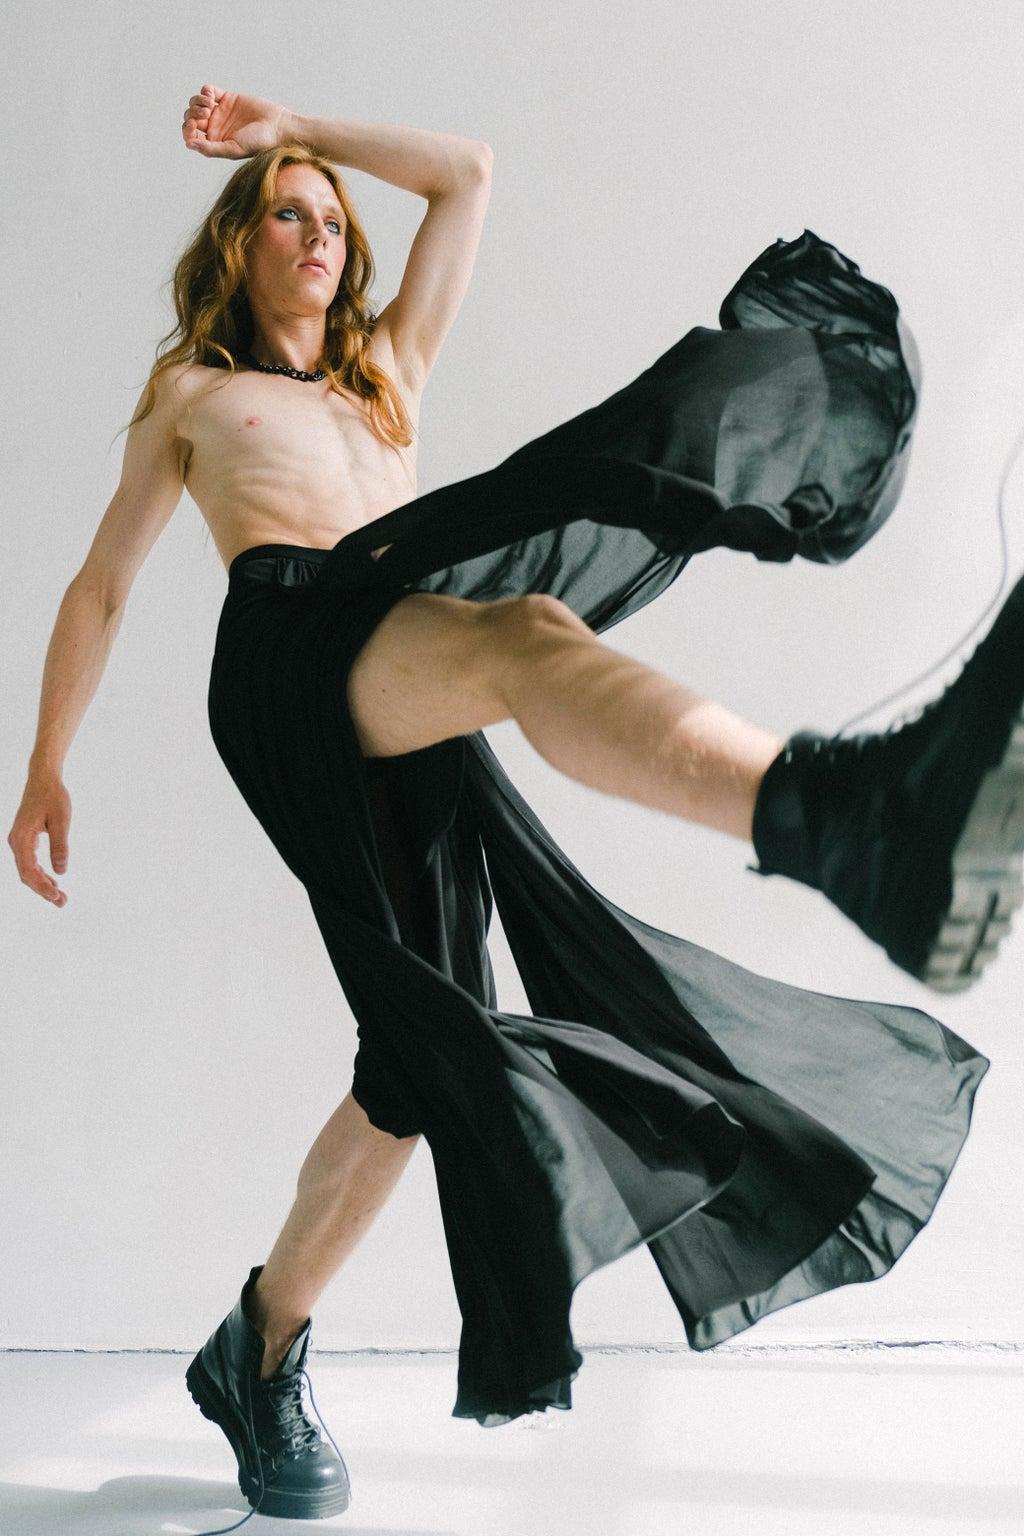 male fashion model posing in a skirt